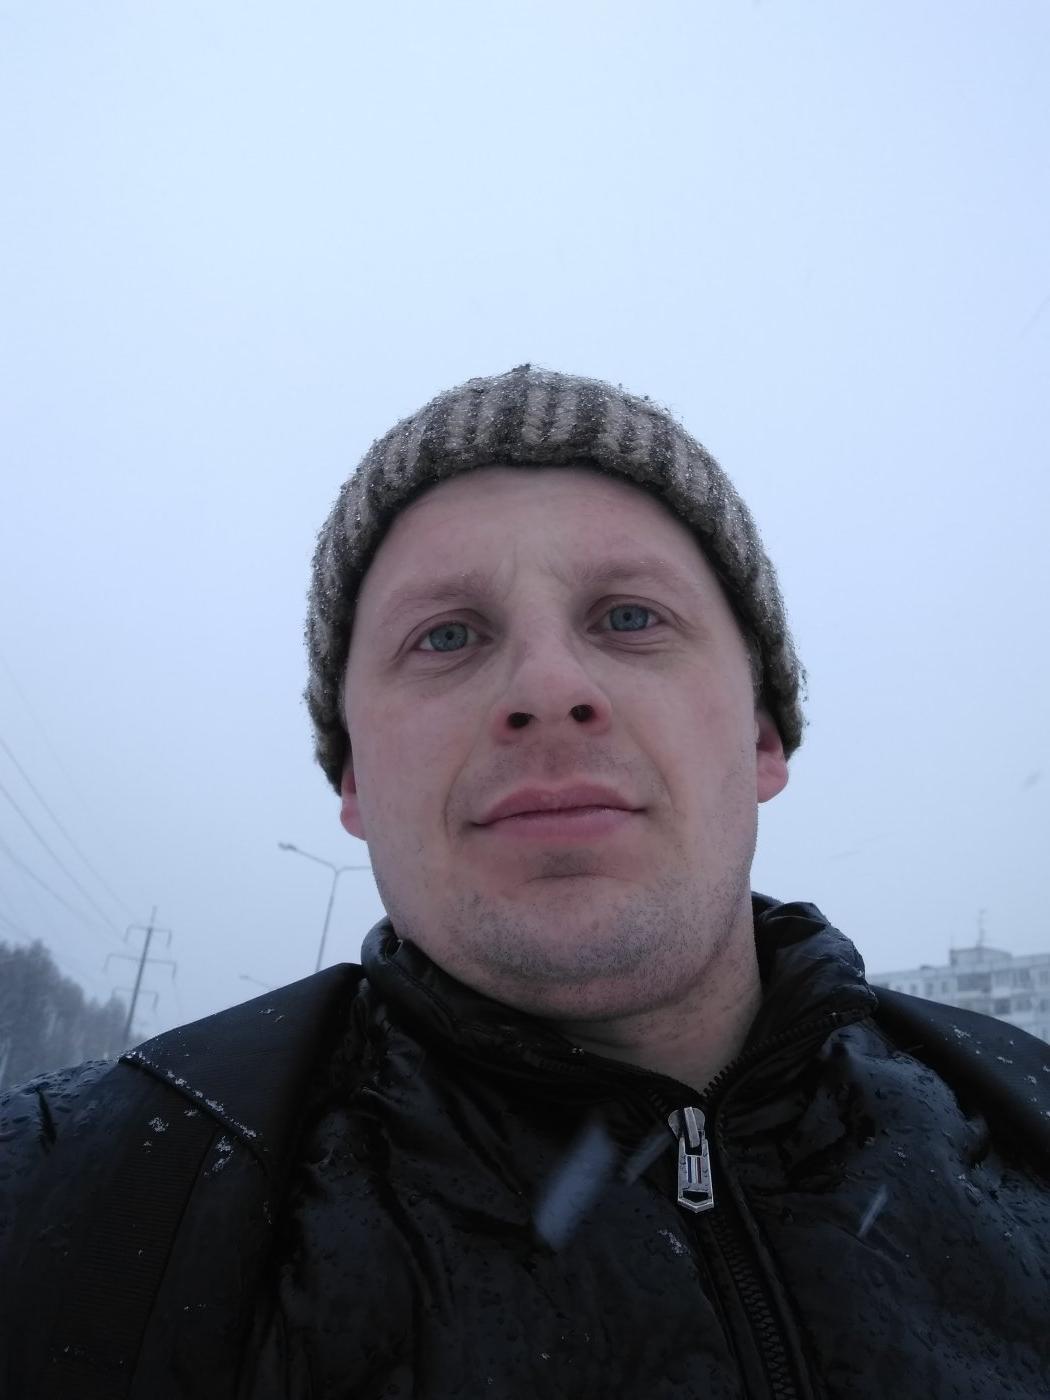 Путана Изюминки, 25 лет, метро Румянцево